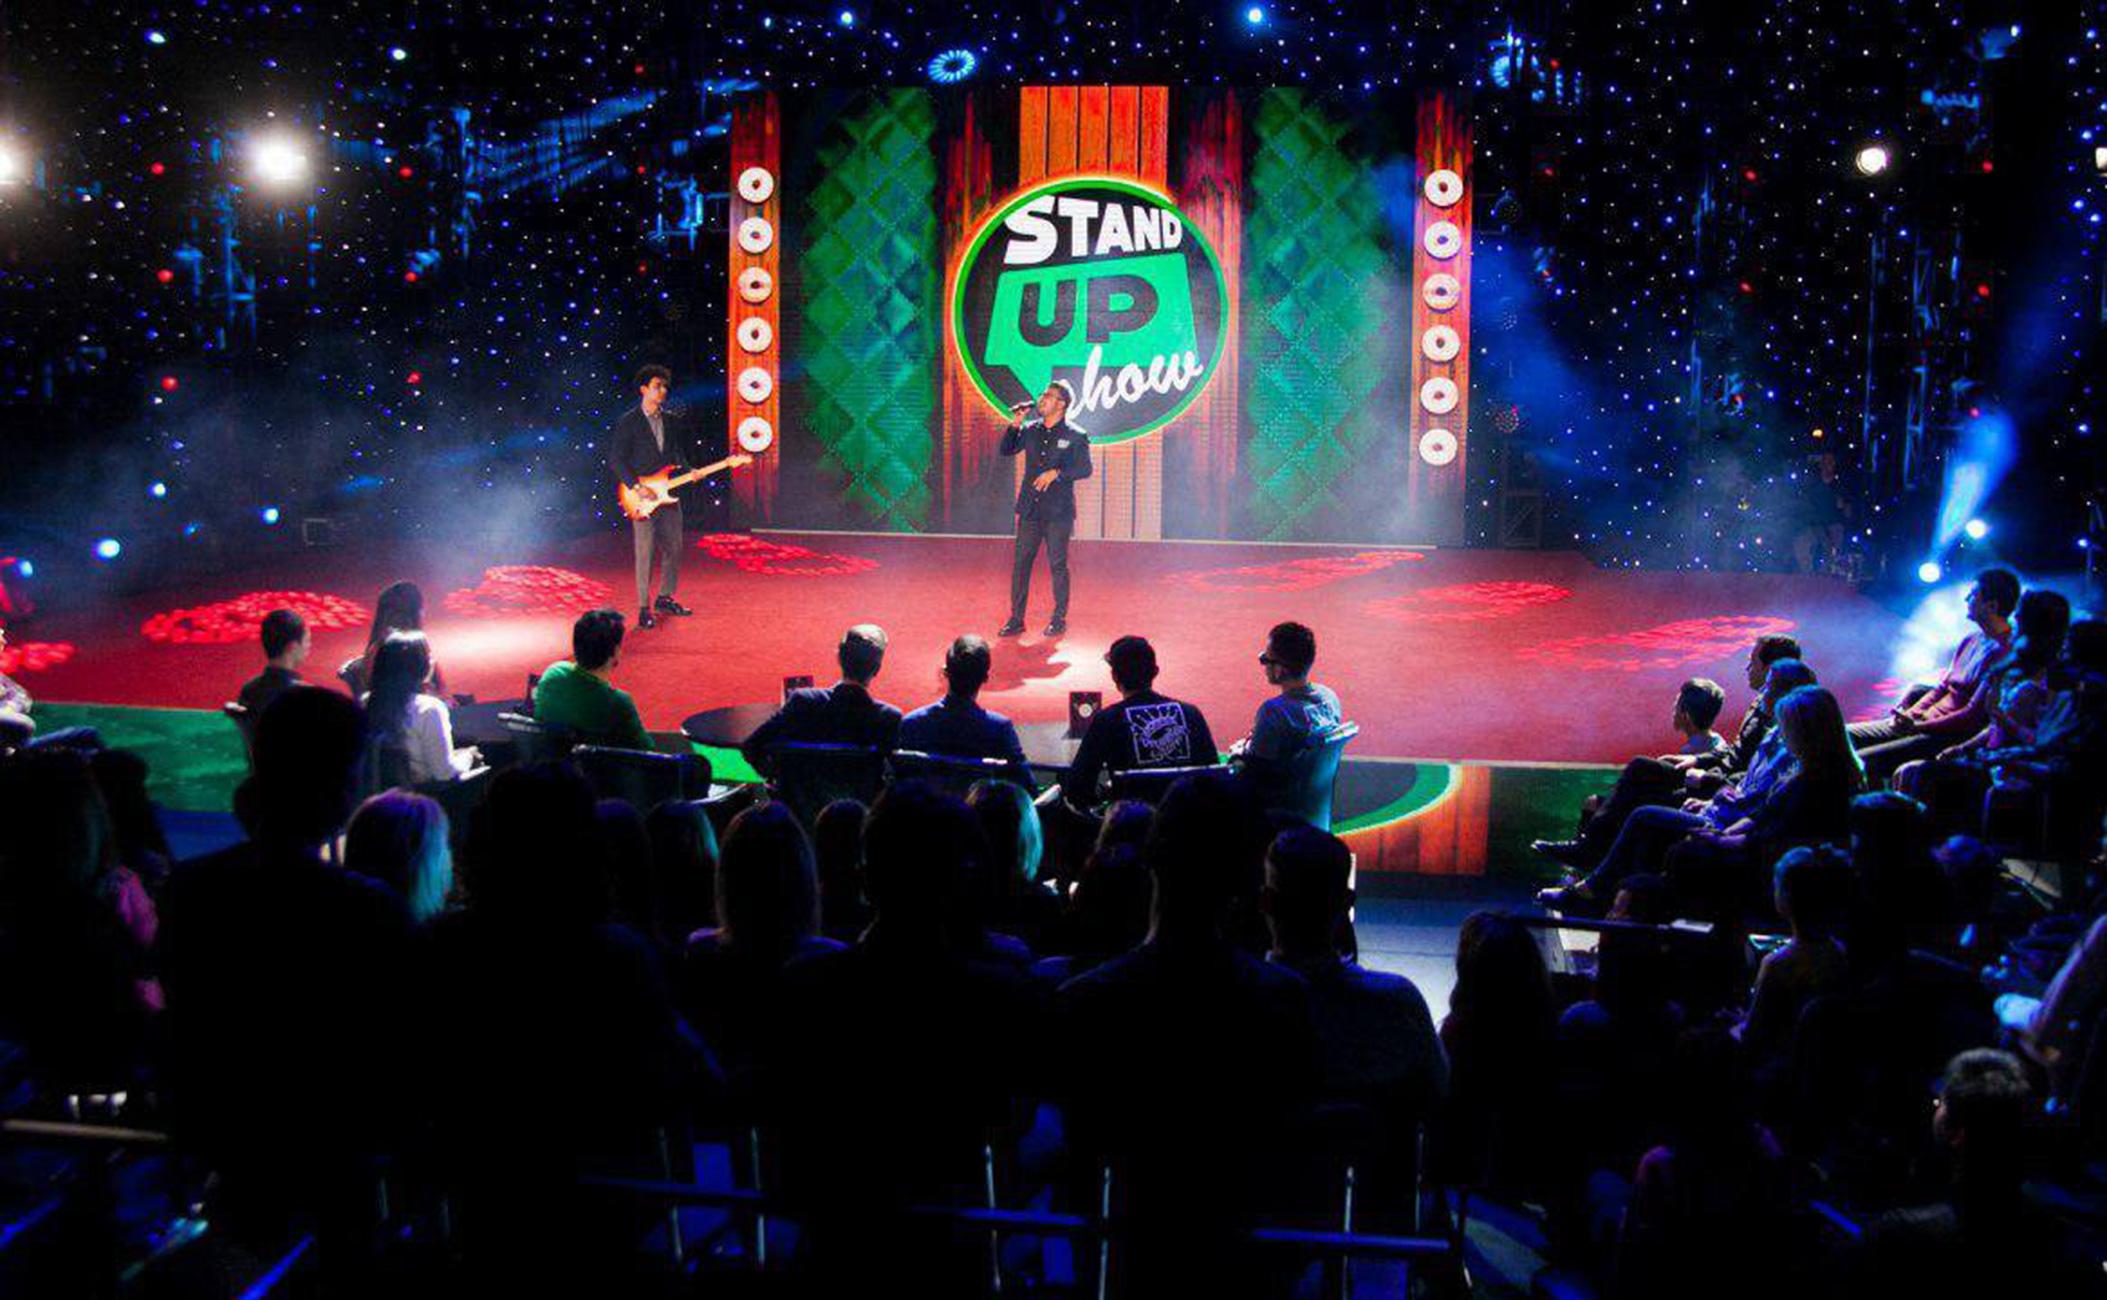 Uzbekistani TV channels gain popularity, displacing Russian programmes